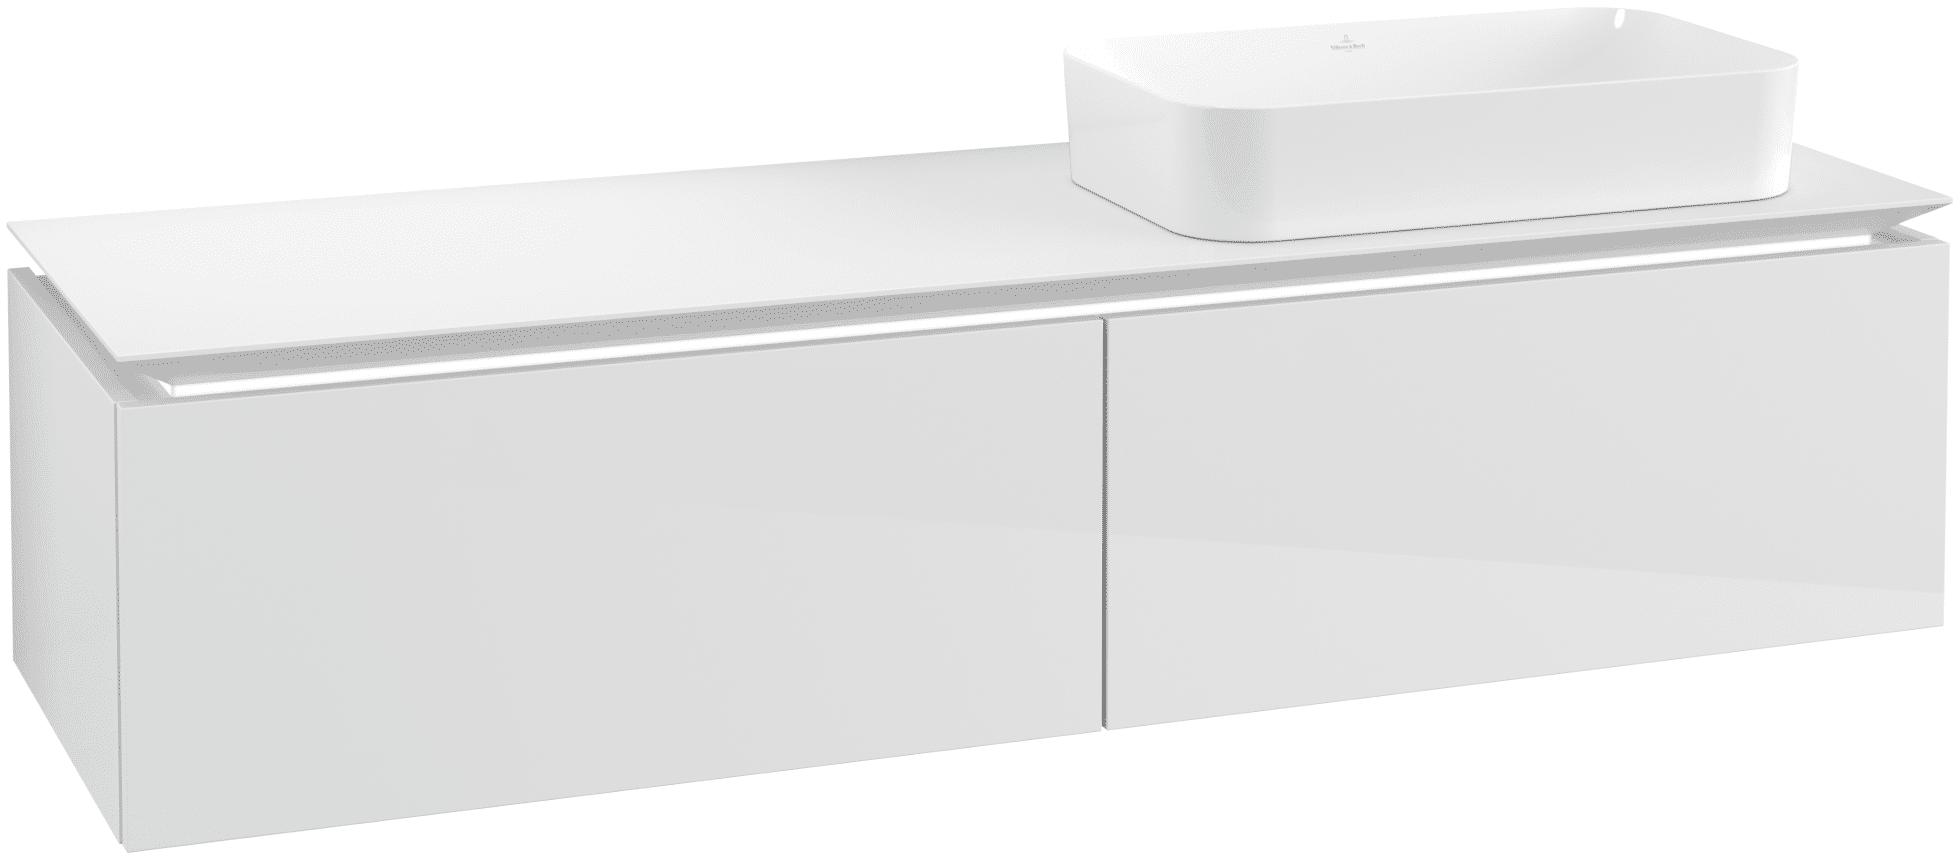 Villeroy & Boch Villeroy & Boch Legato - Meuble sous lavabo with 2 drawers & 1 cut-out right 1600 x 380 x 500mm blanc lustré